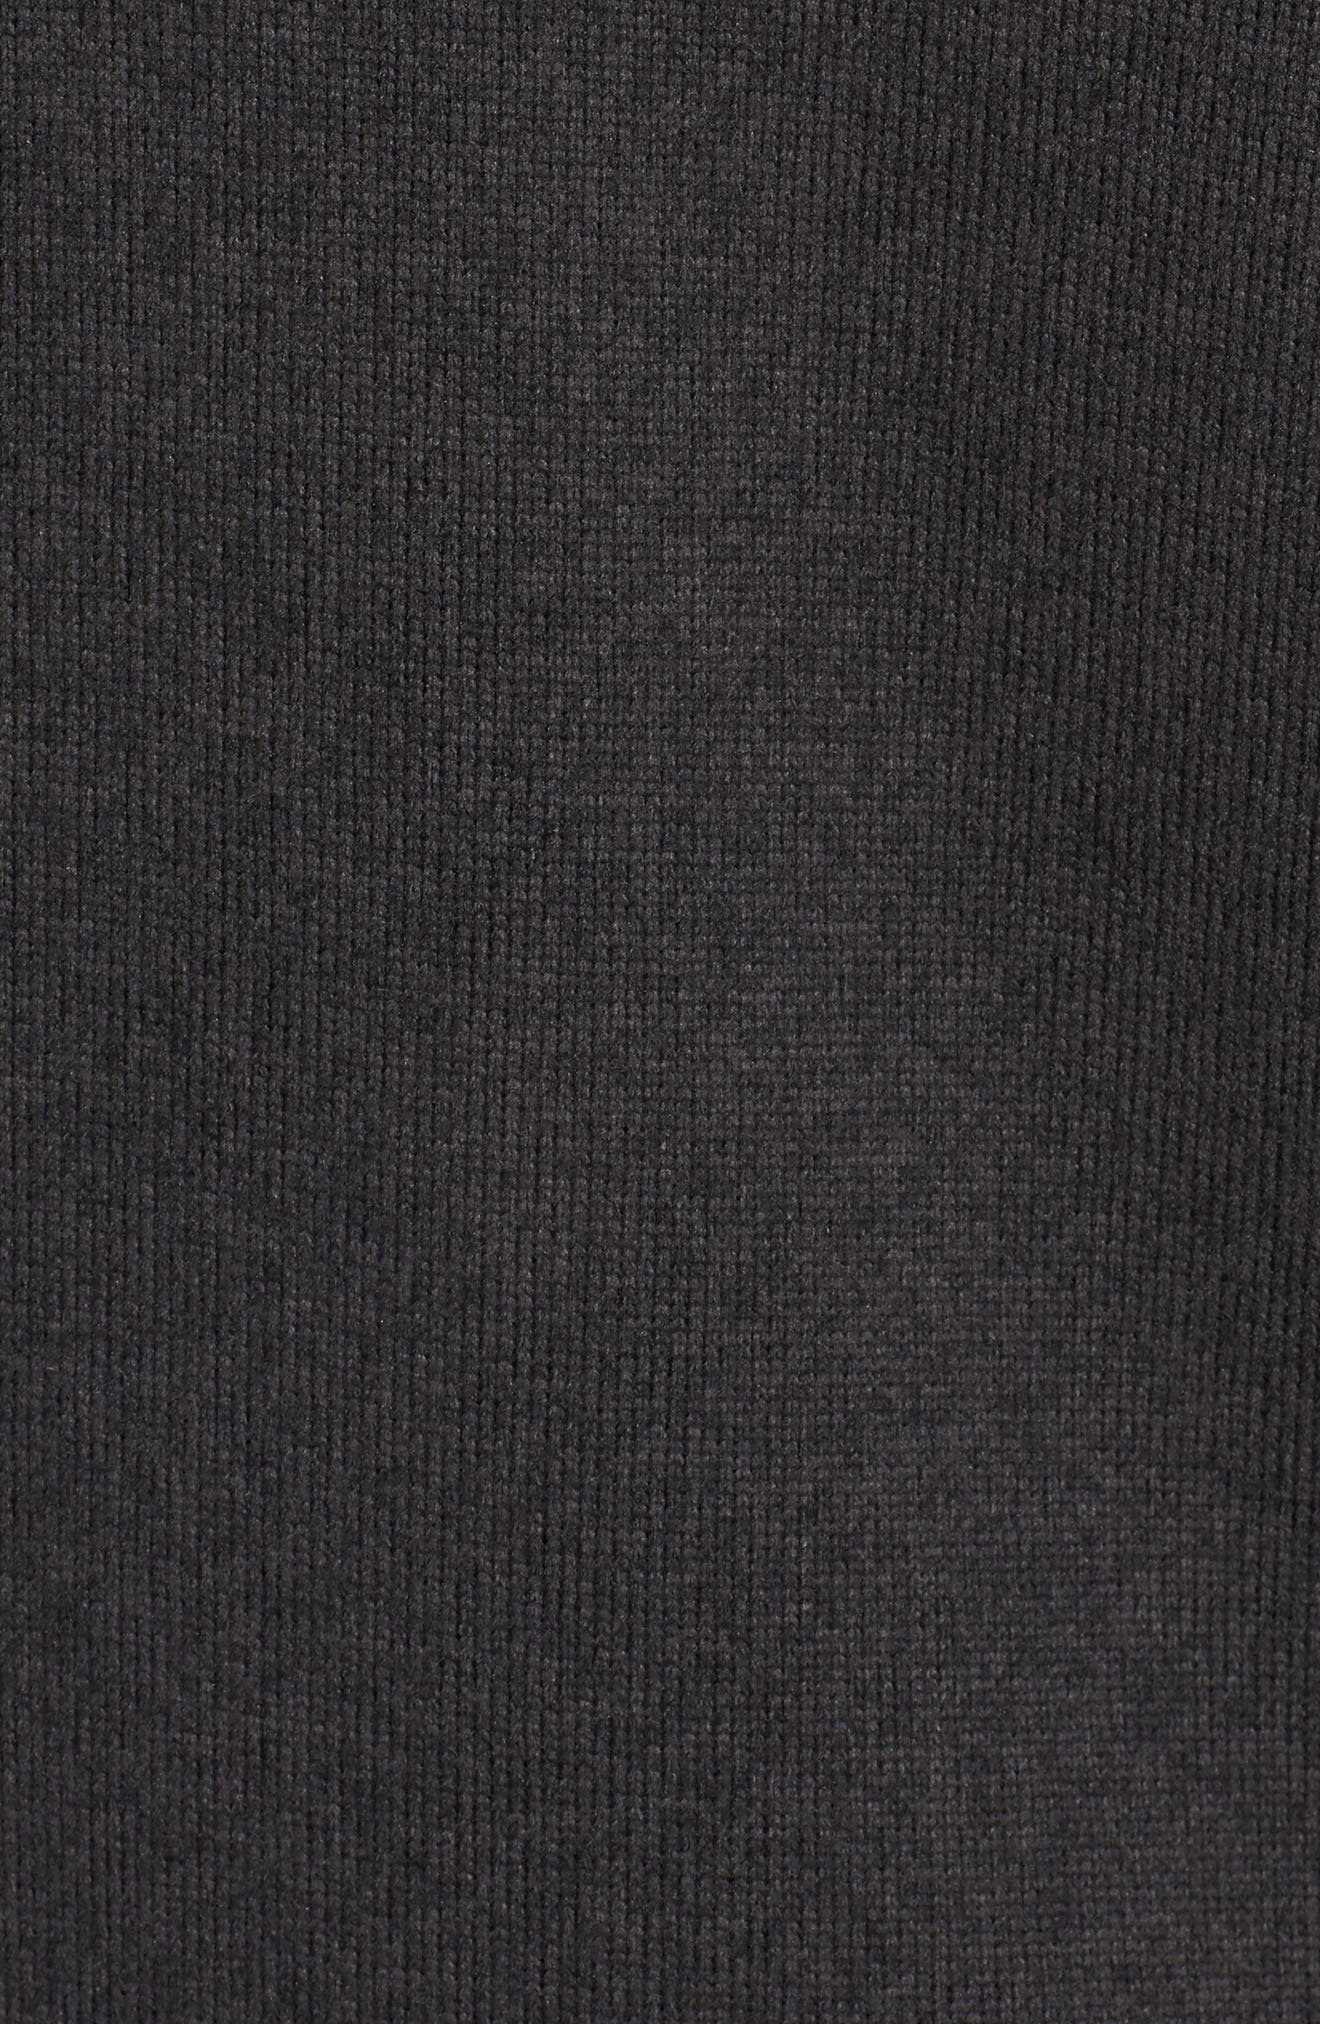 THE NORTH FACE, Gordon Lyons Quarter-Zip Fleece Jacket, Alternate thumbnail 6, color, 001